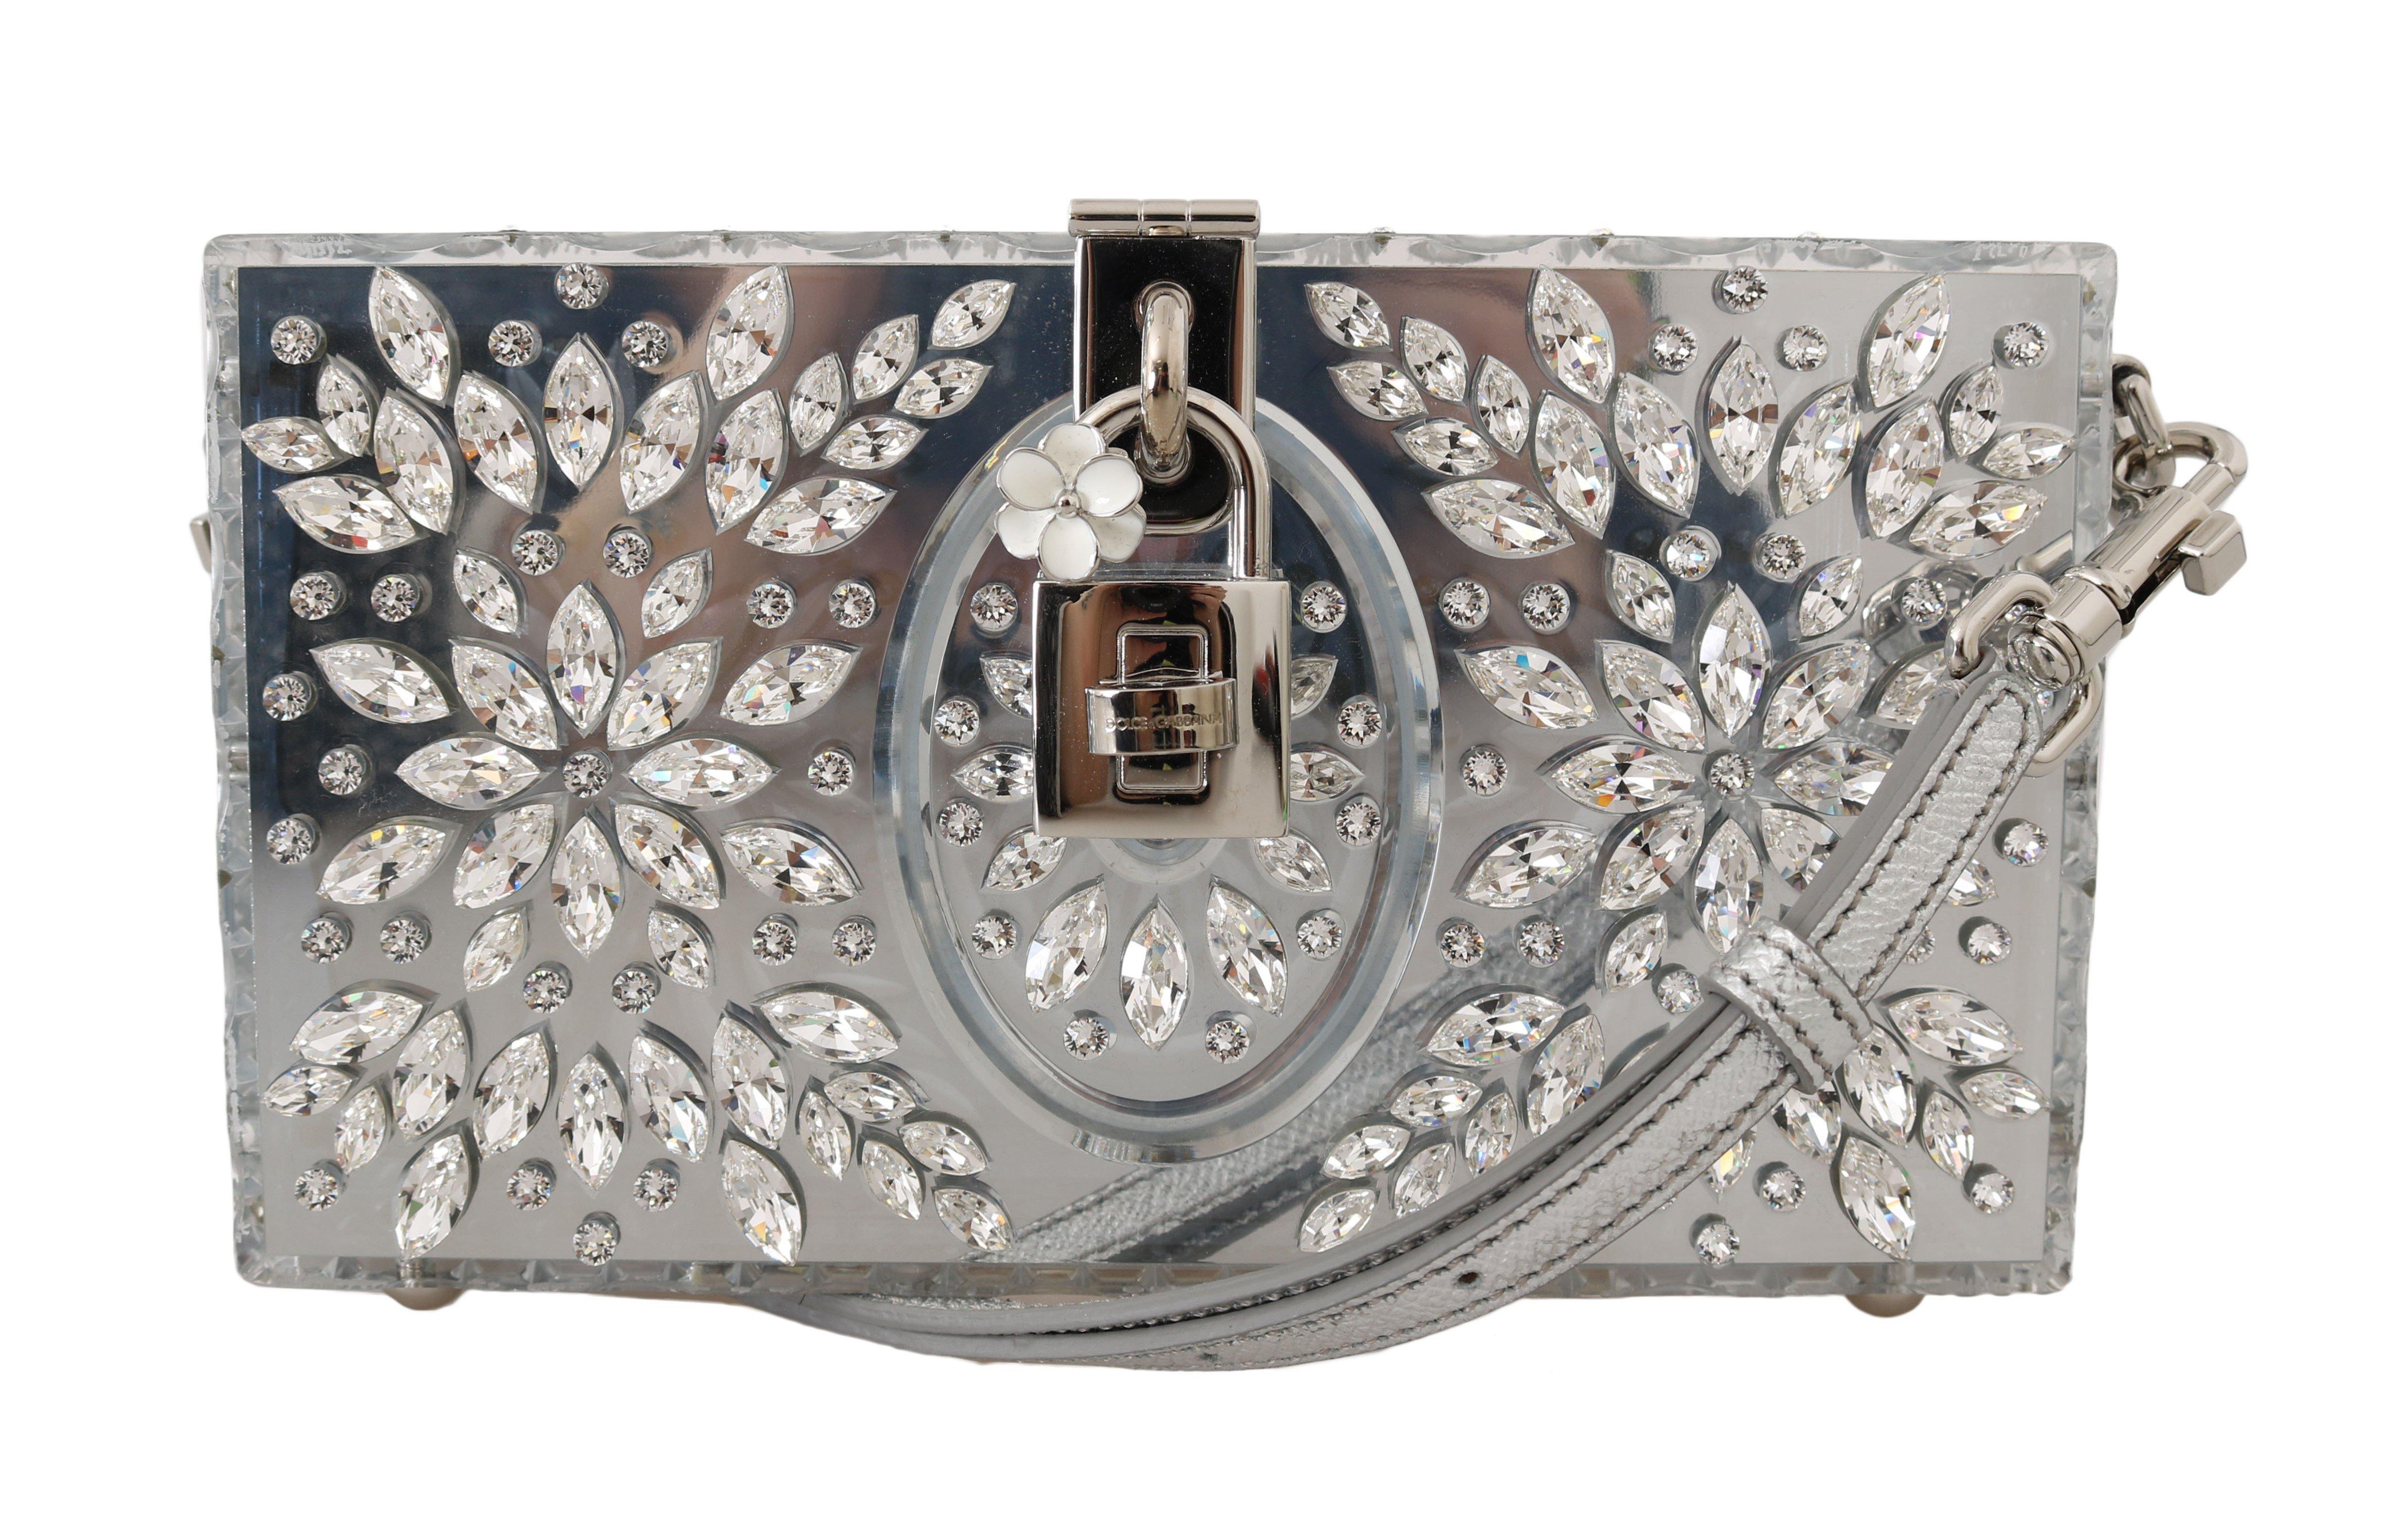 Dolce & Gabbana Women's Plexi Crystal SICILY Clutch Bag Silver VAS15064